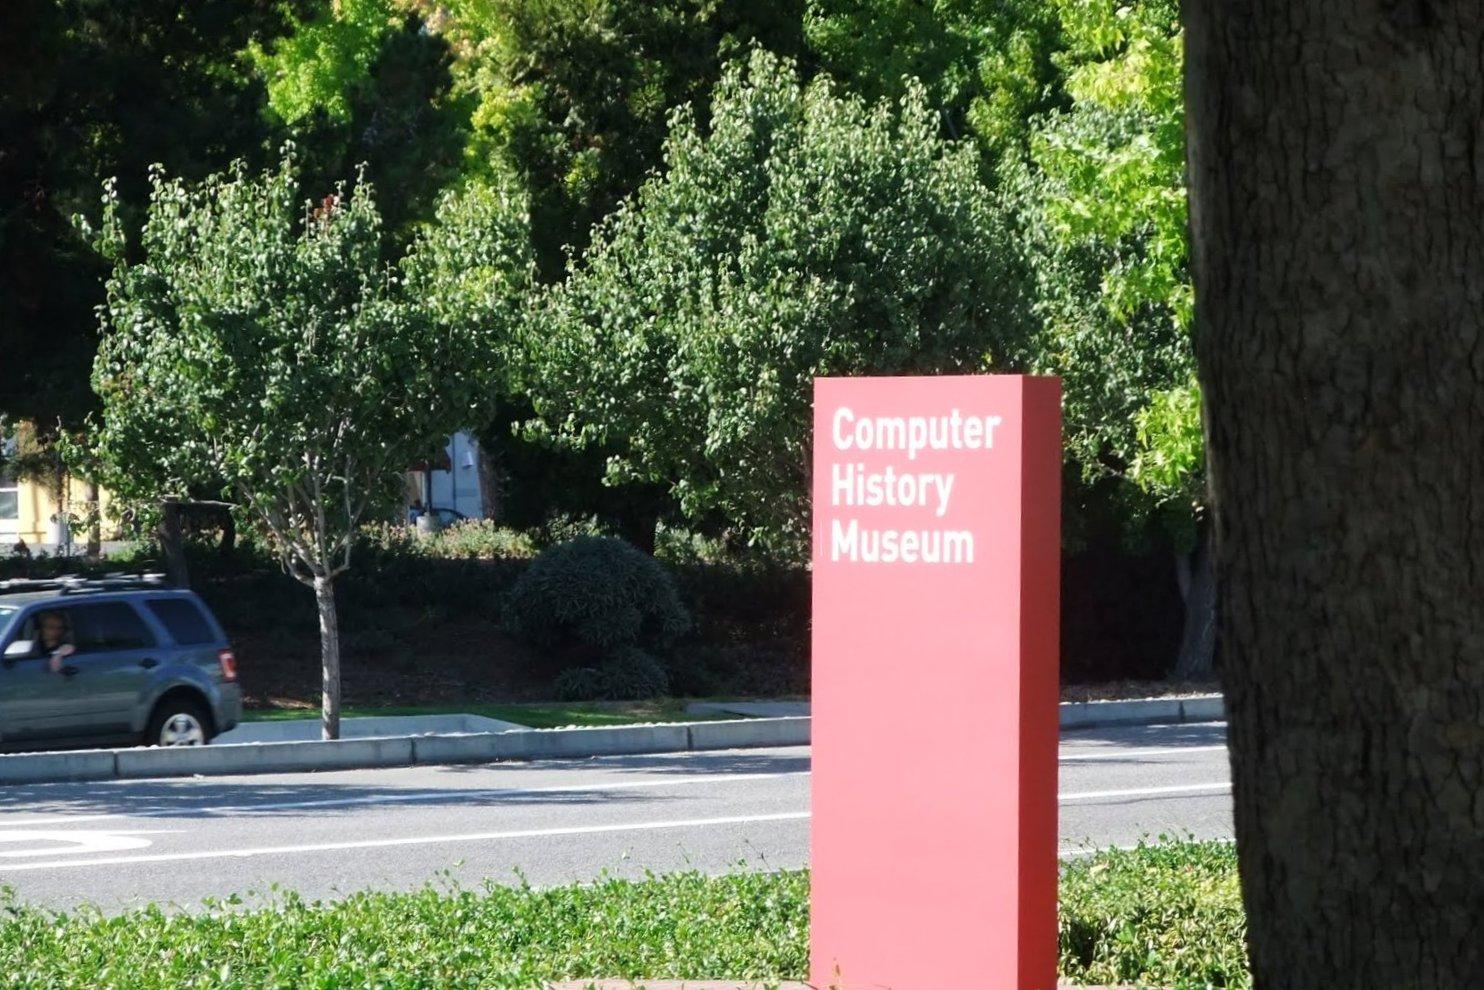 computer-history-museum-billboard